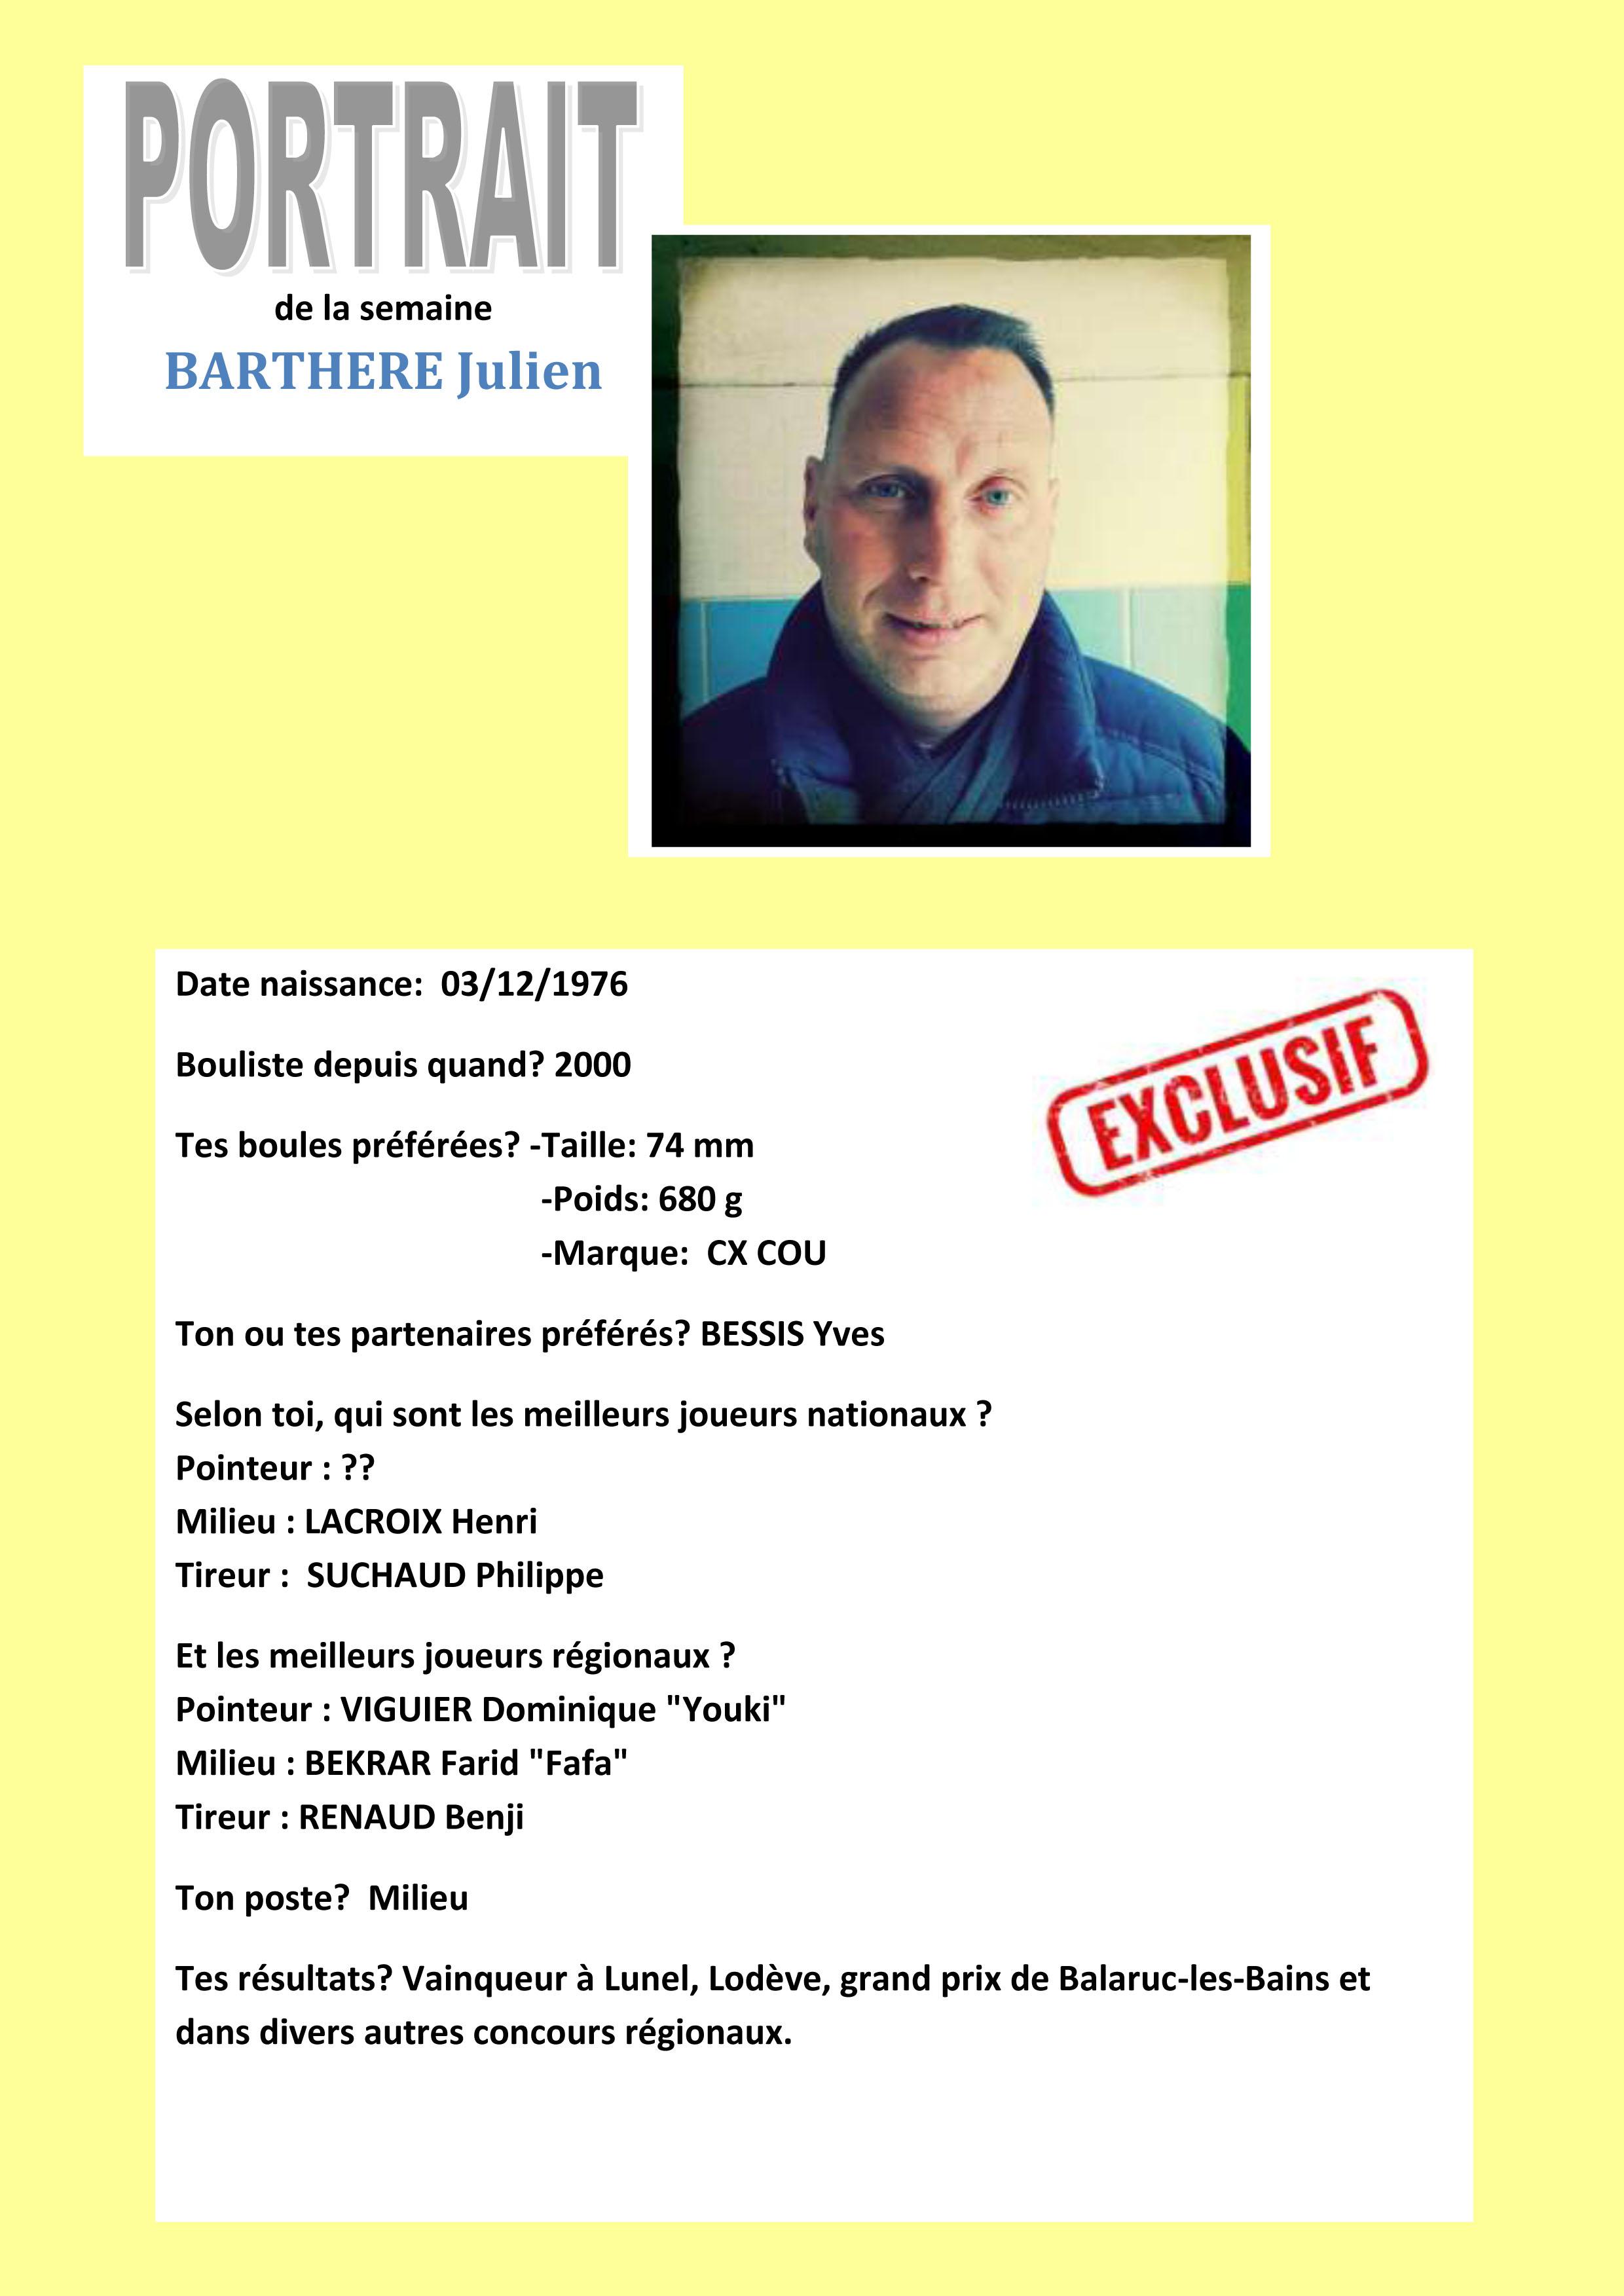 PortraitBarthereJulien.jpg